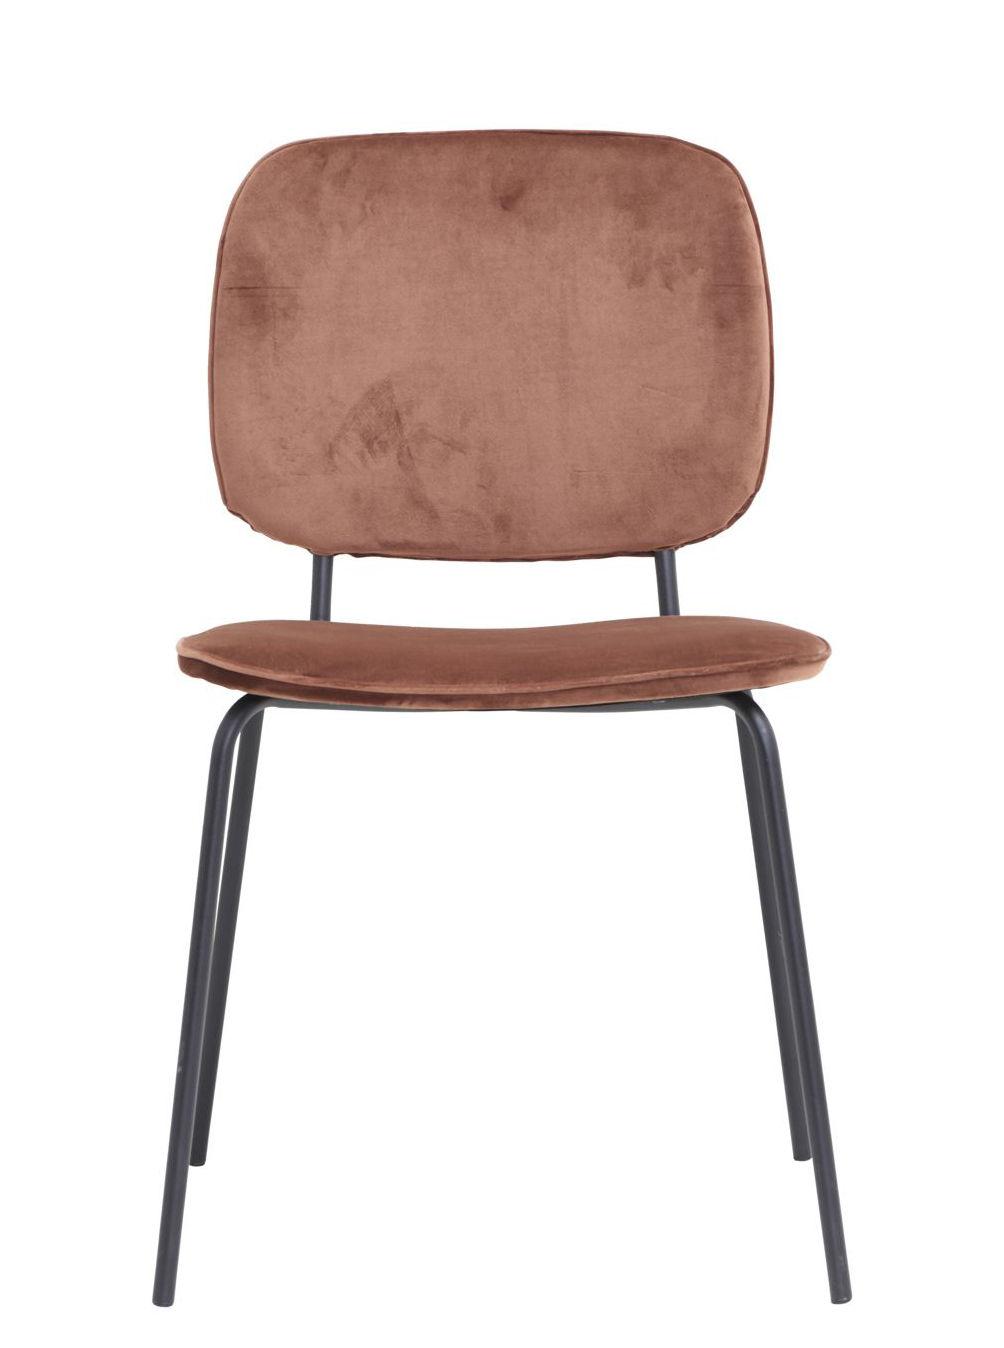 Möbel - Stühle  - Comma Gepolsterter Stuhl / Velours - House Doctor - Ziegelrot - Schaumstoff, Stahl, Velours